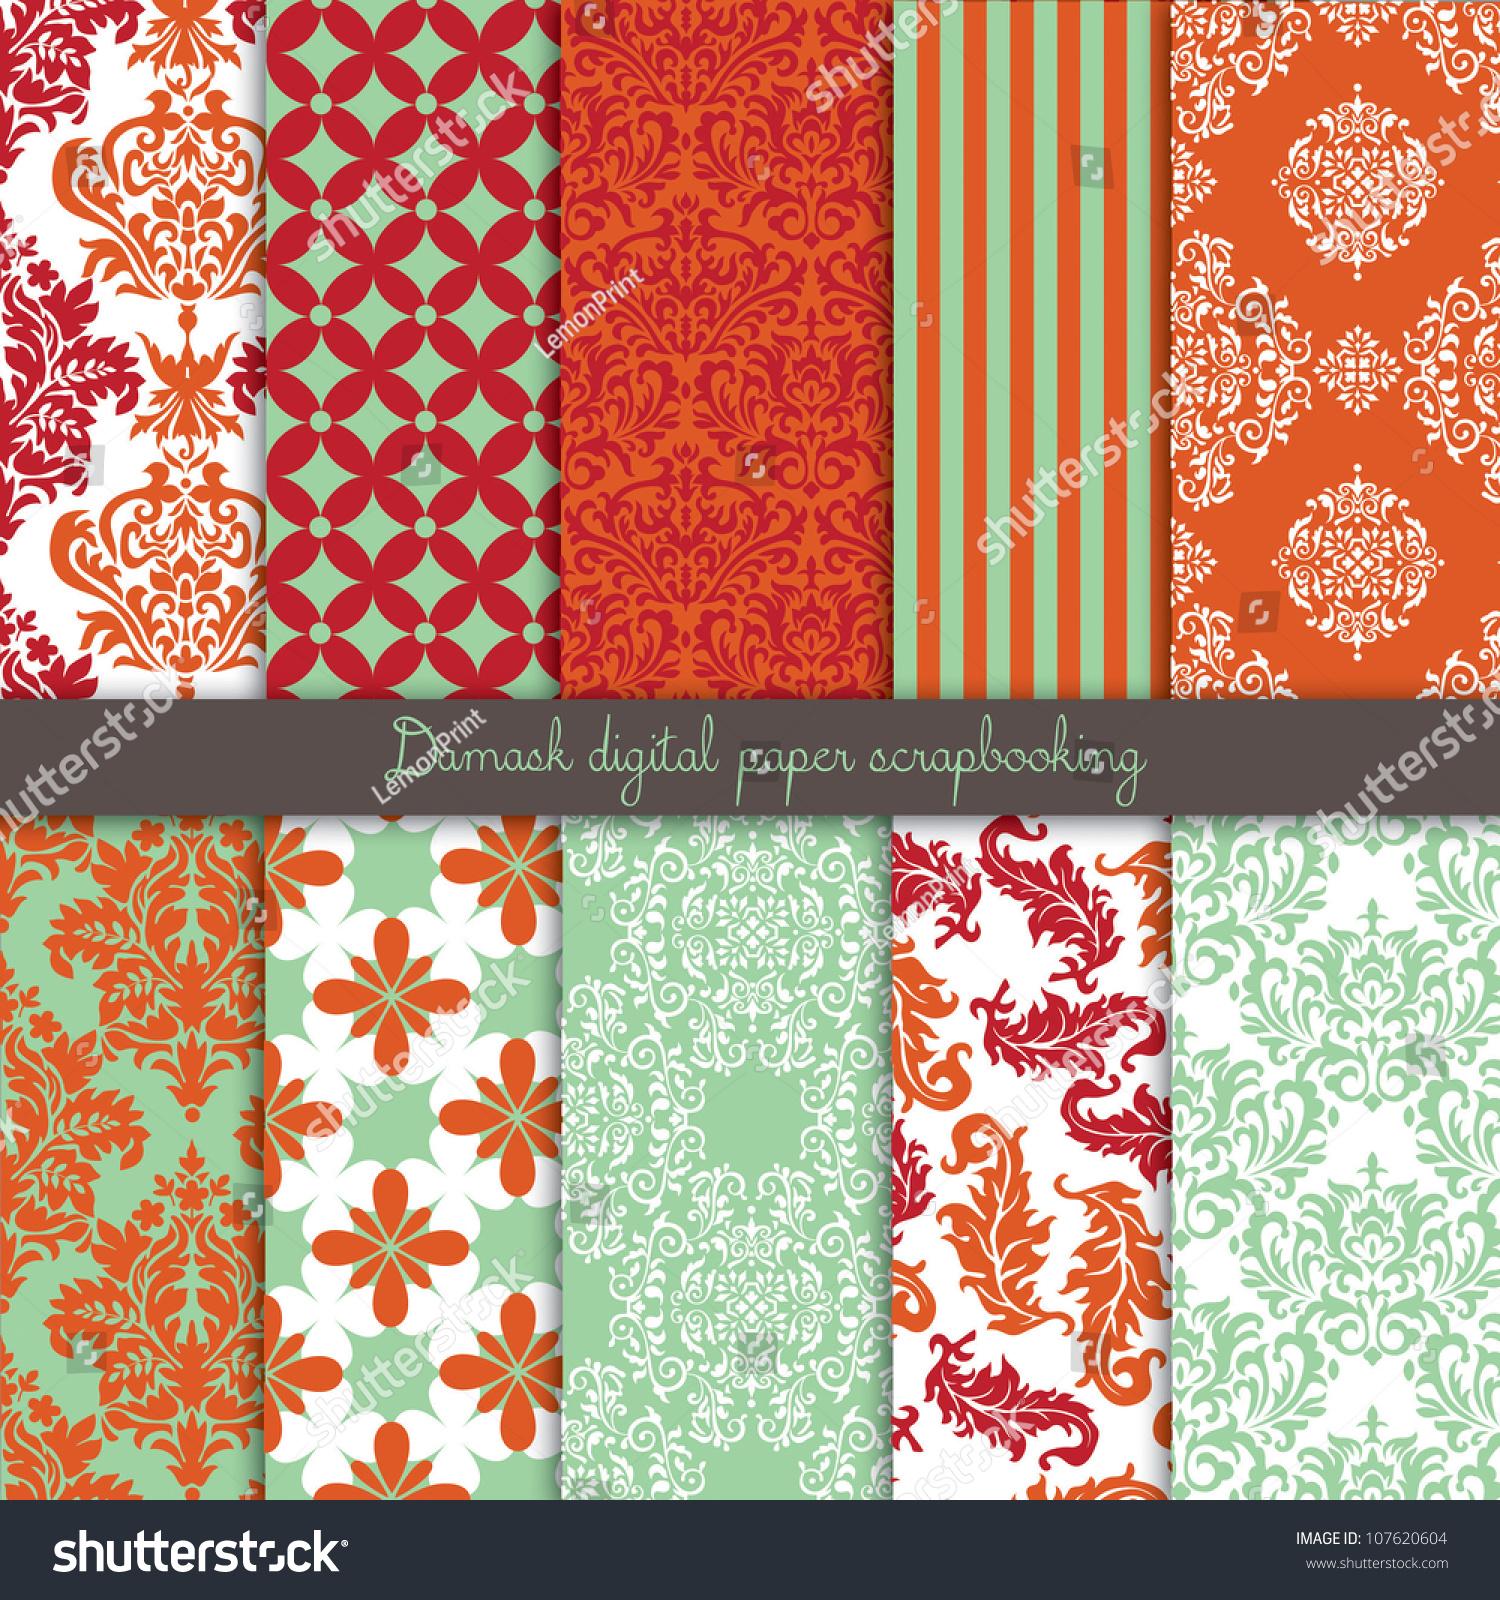 Damask Scrapbook Paper Stock Vector Illustration 107620604 : Shutterstock